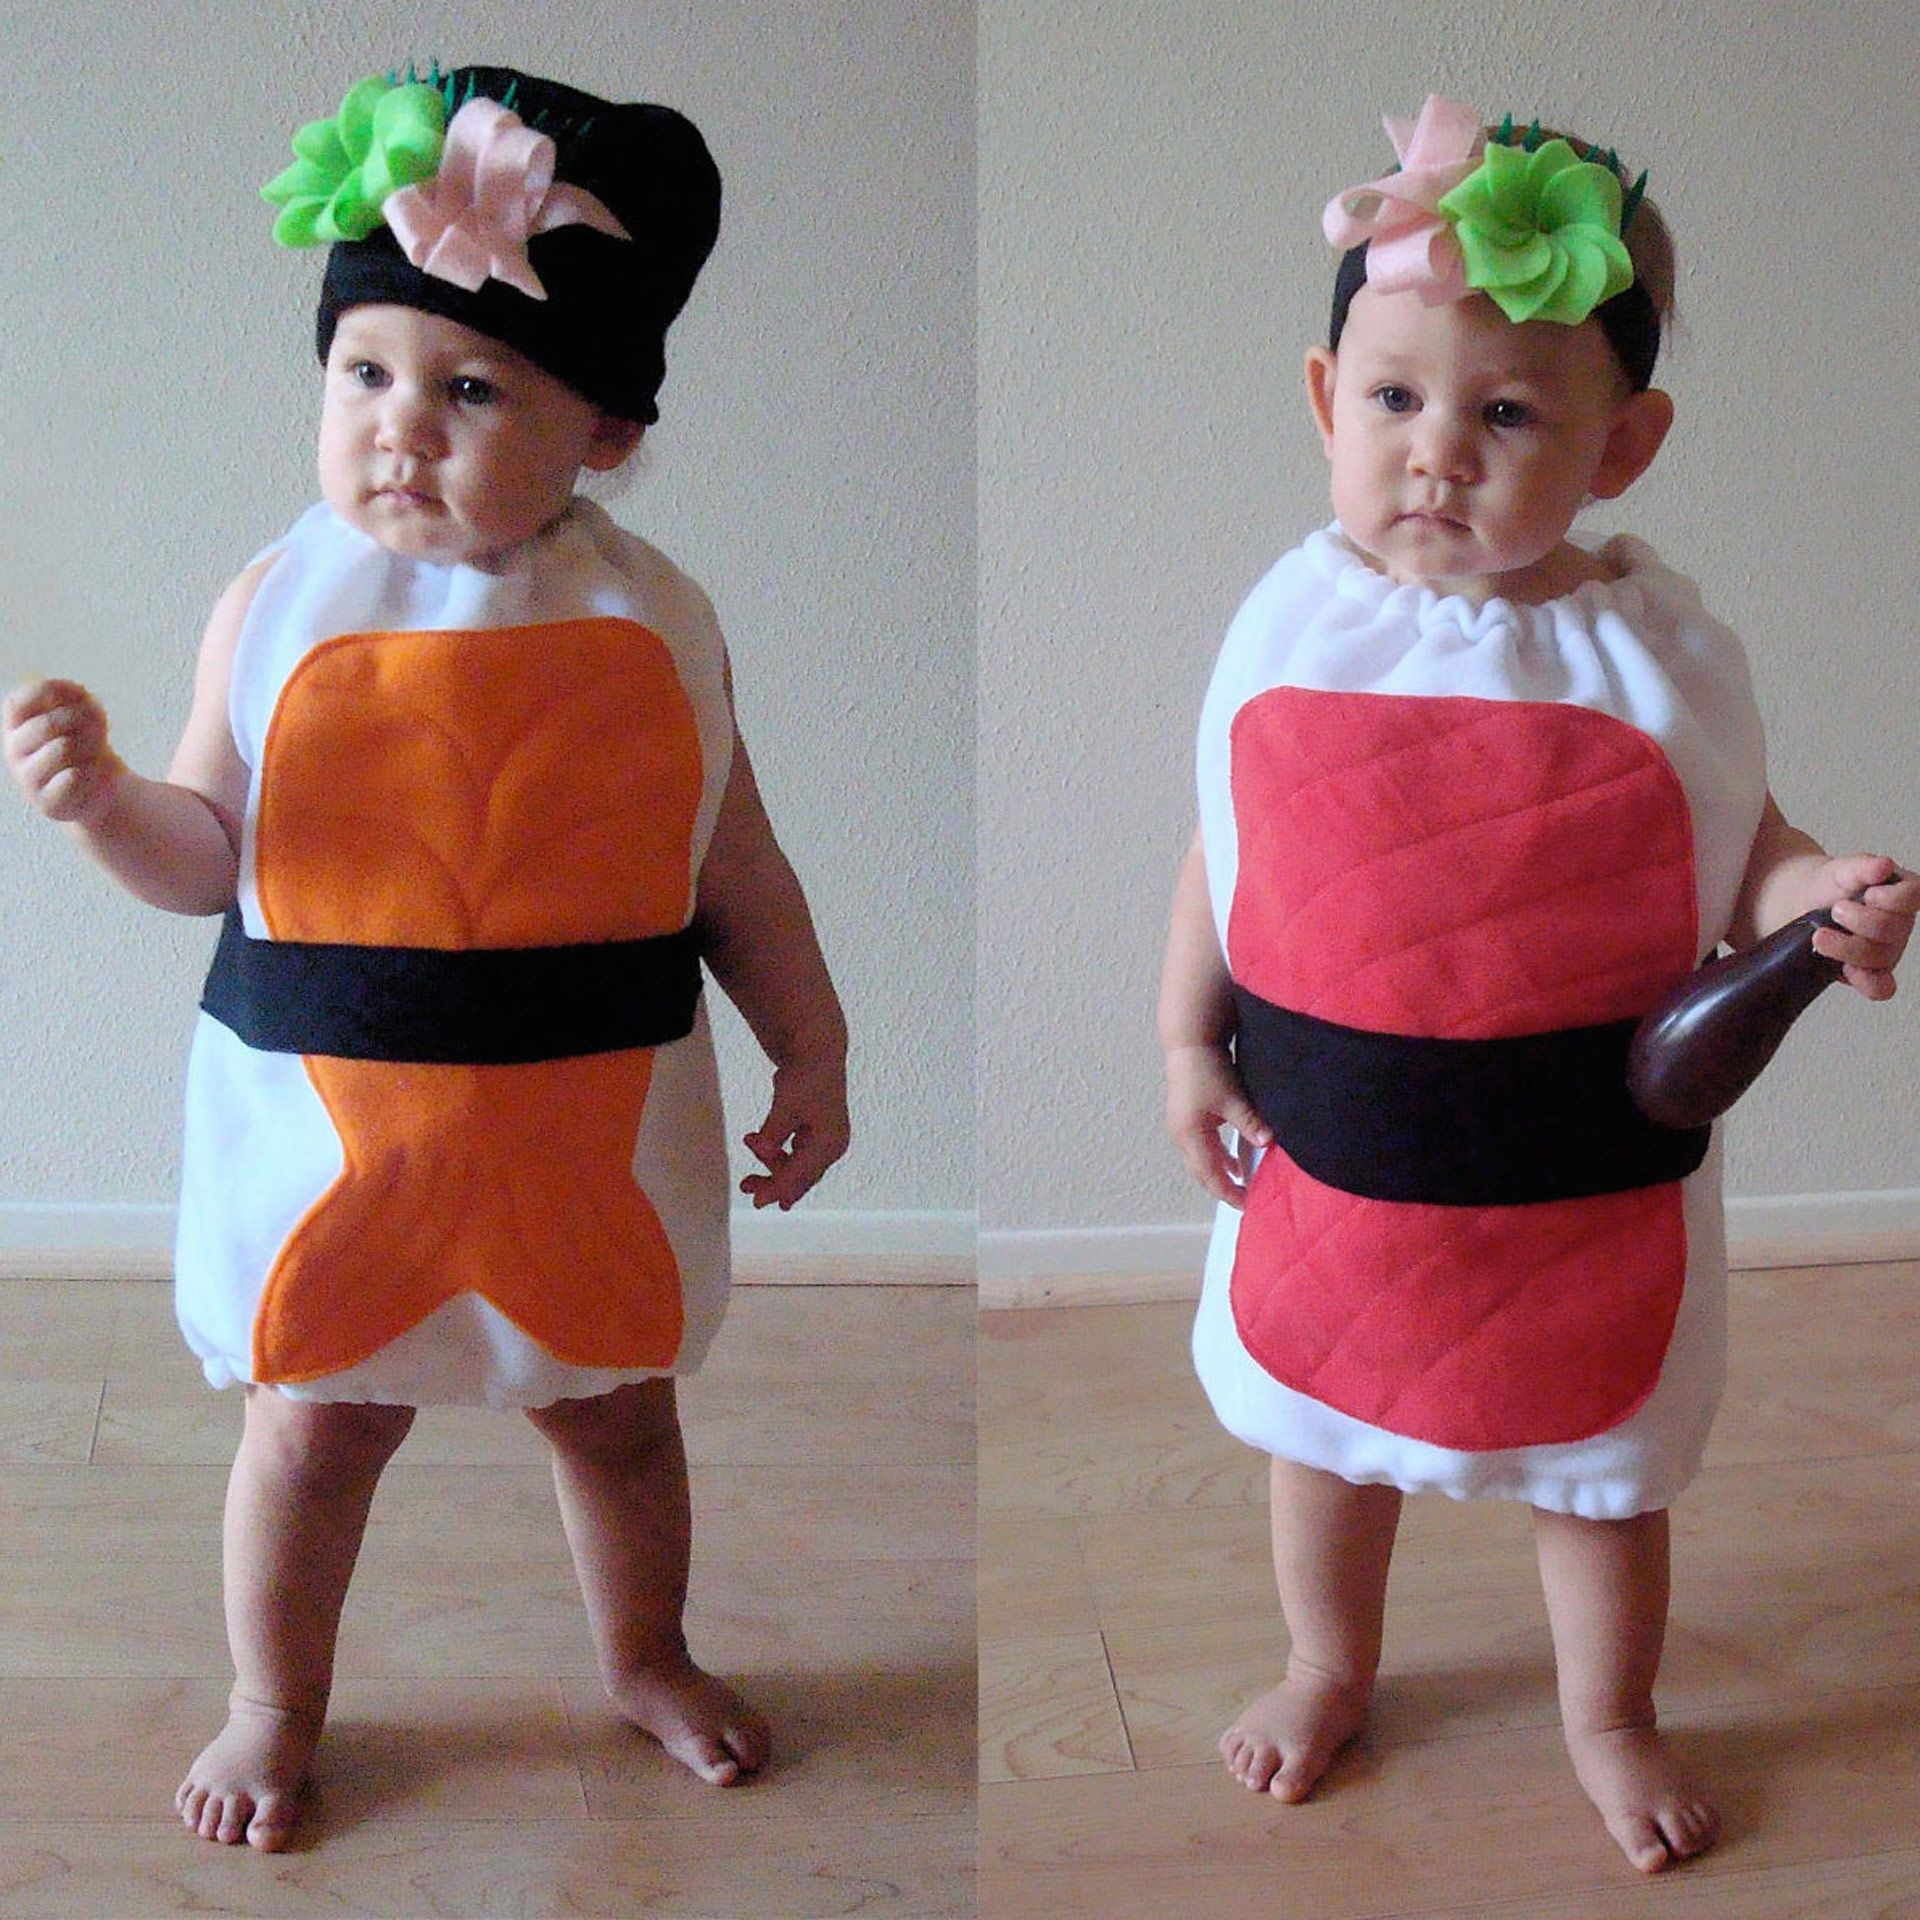 8 Baby Halloween Costumes Kids Dressed as Food Halloween Costumes